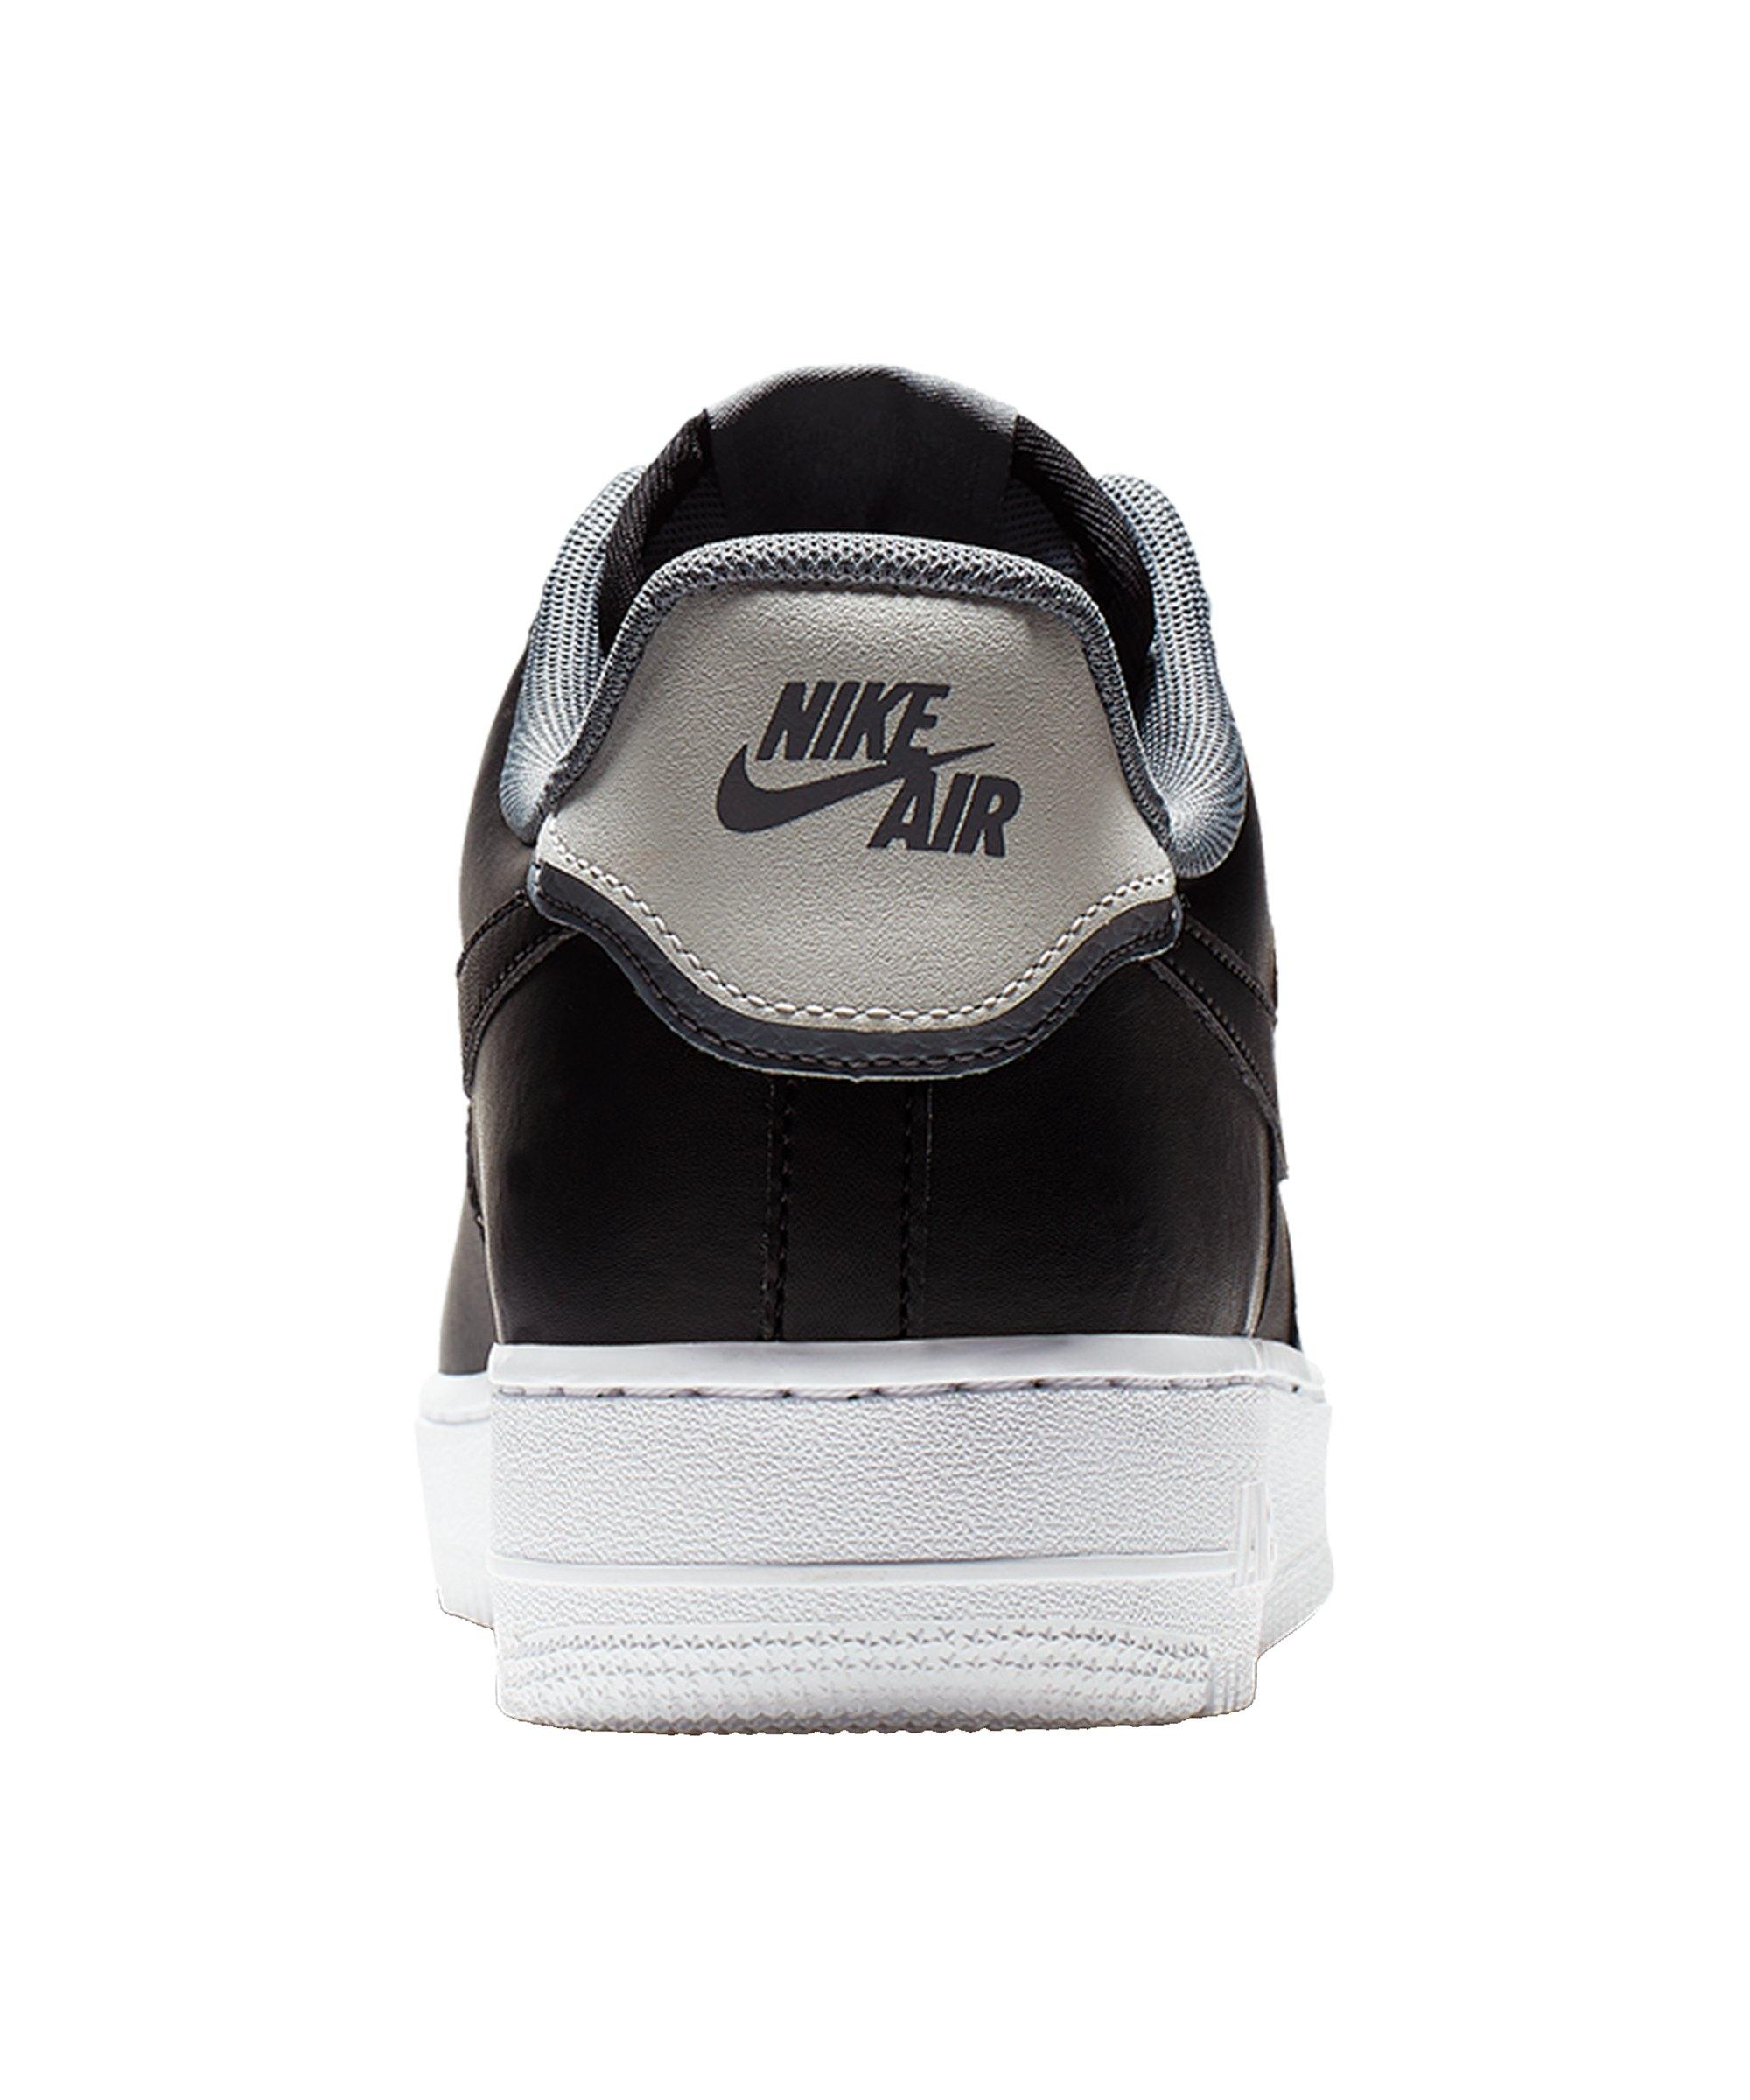 best service d65fd 50546 ... Nike Air Force 1 07 LV8 Sneaker Schwarz Grau F002 - Schwarz ...